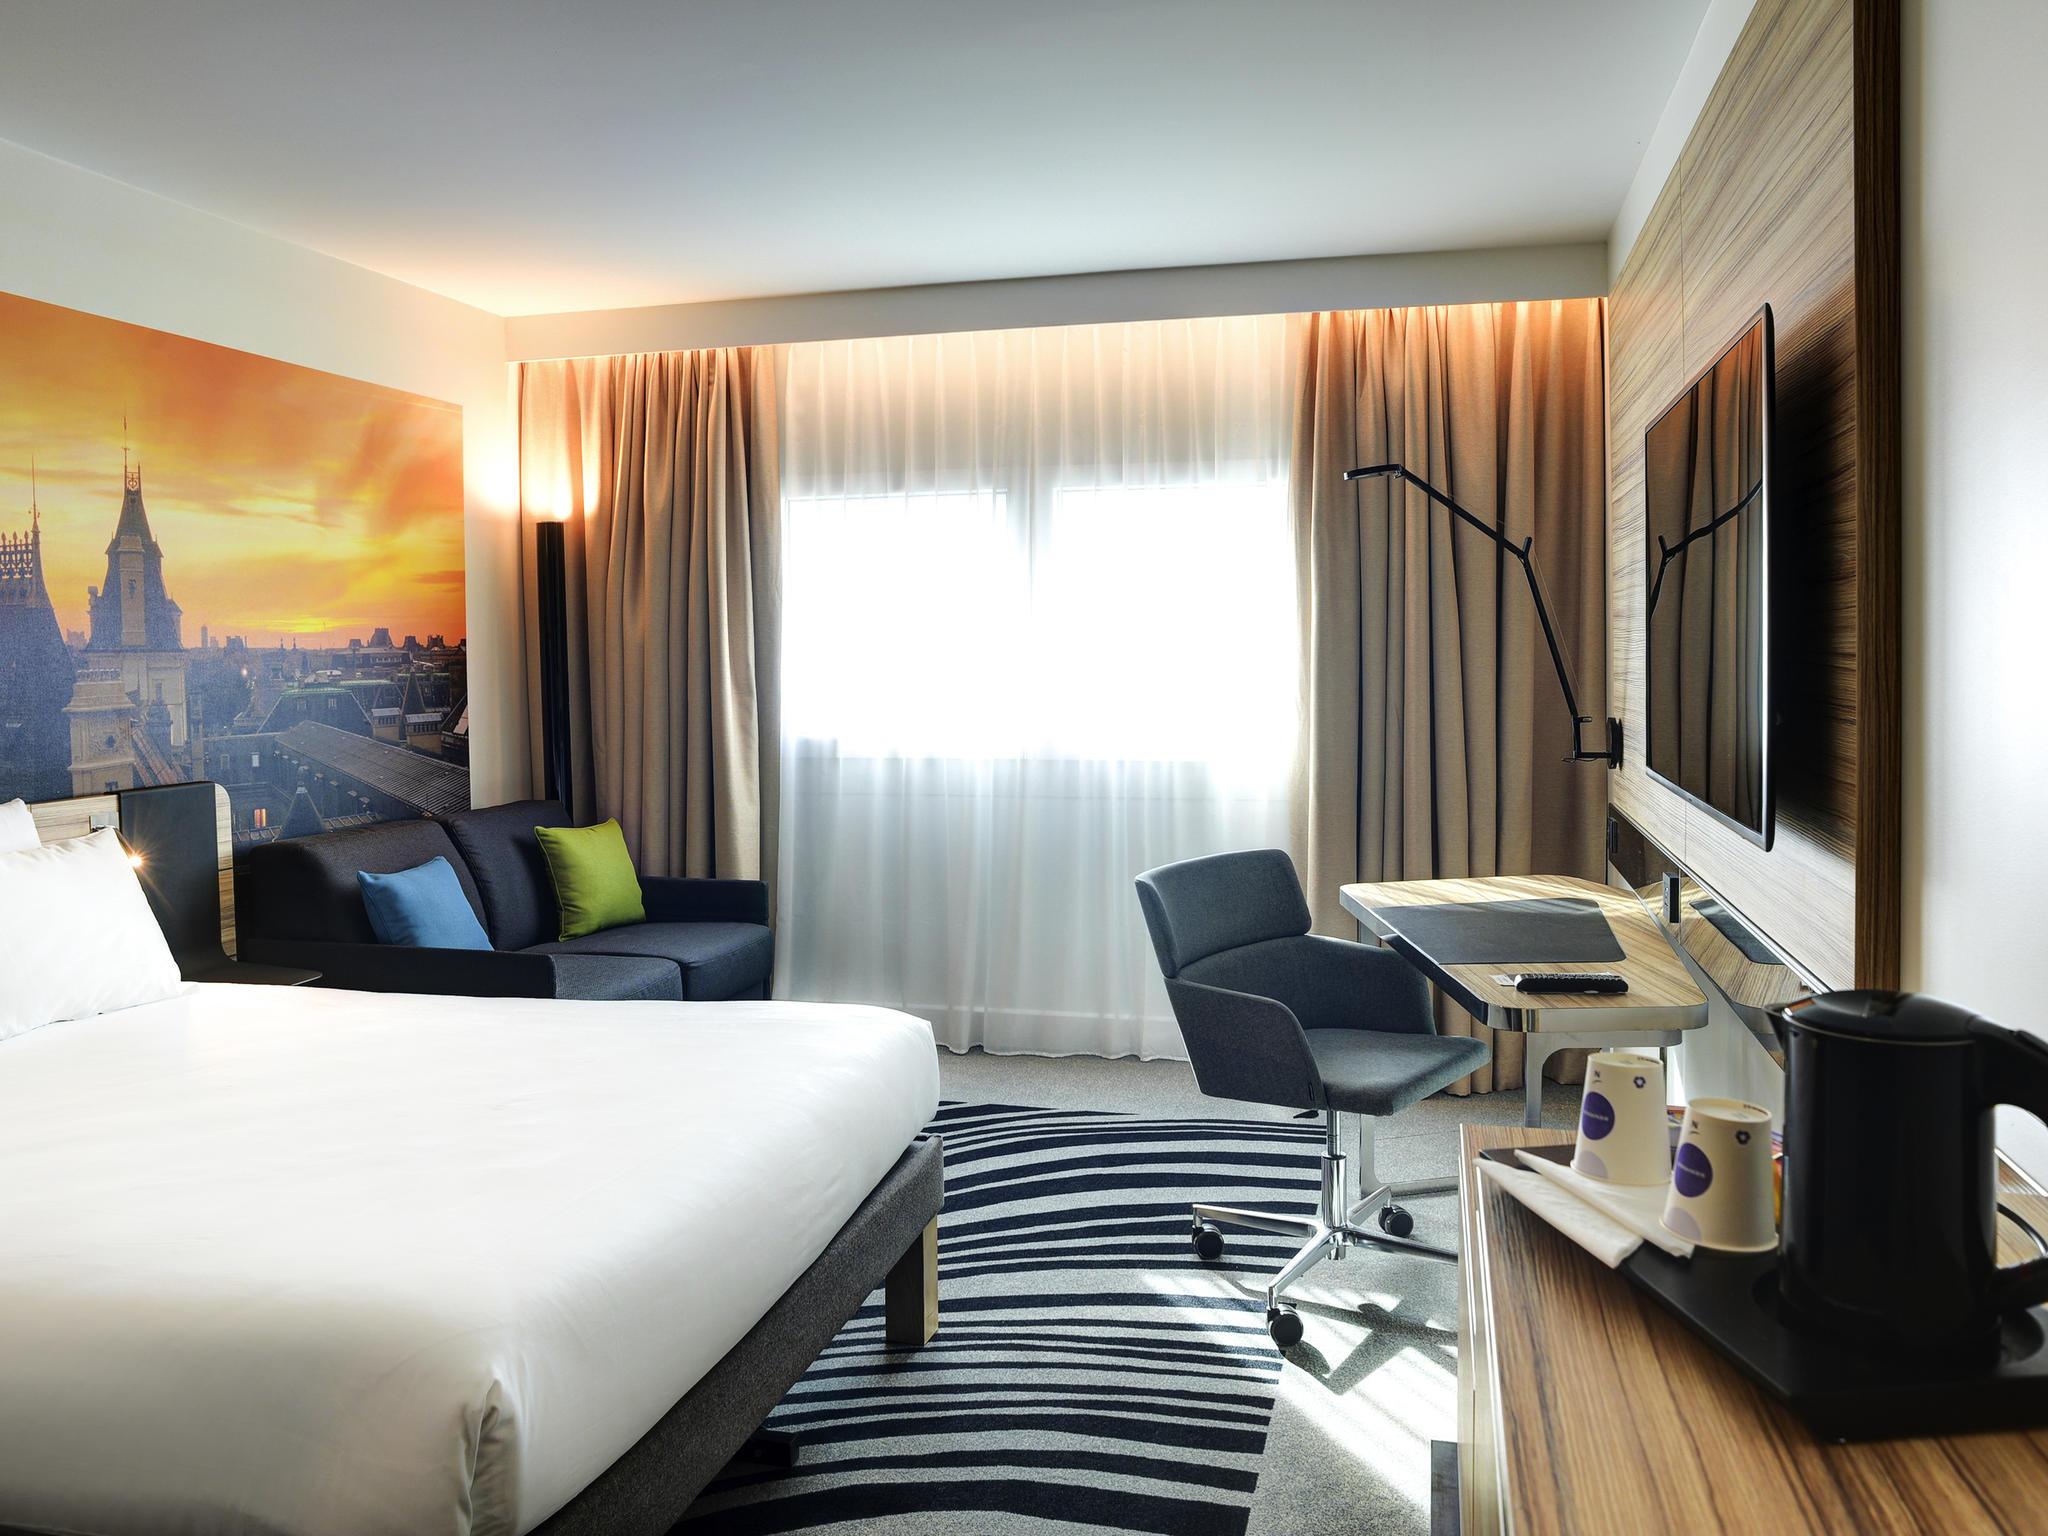 فندق - نوفوتيل Novotel باريس 14 بورت دورليان